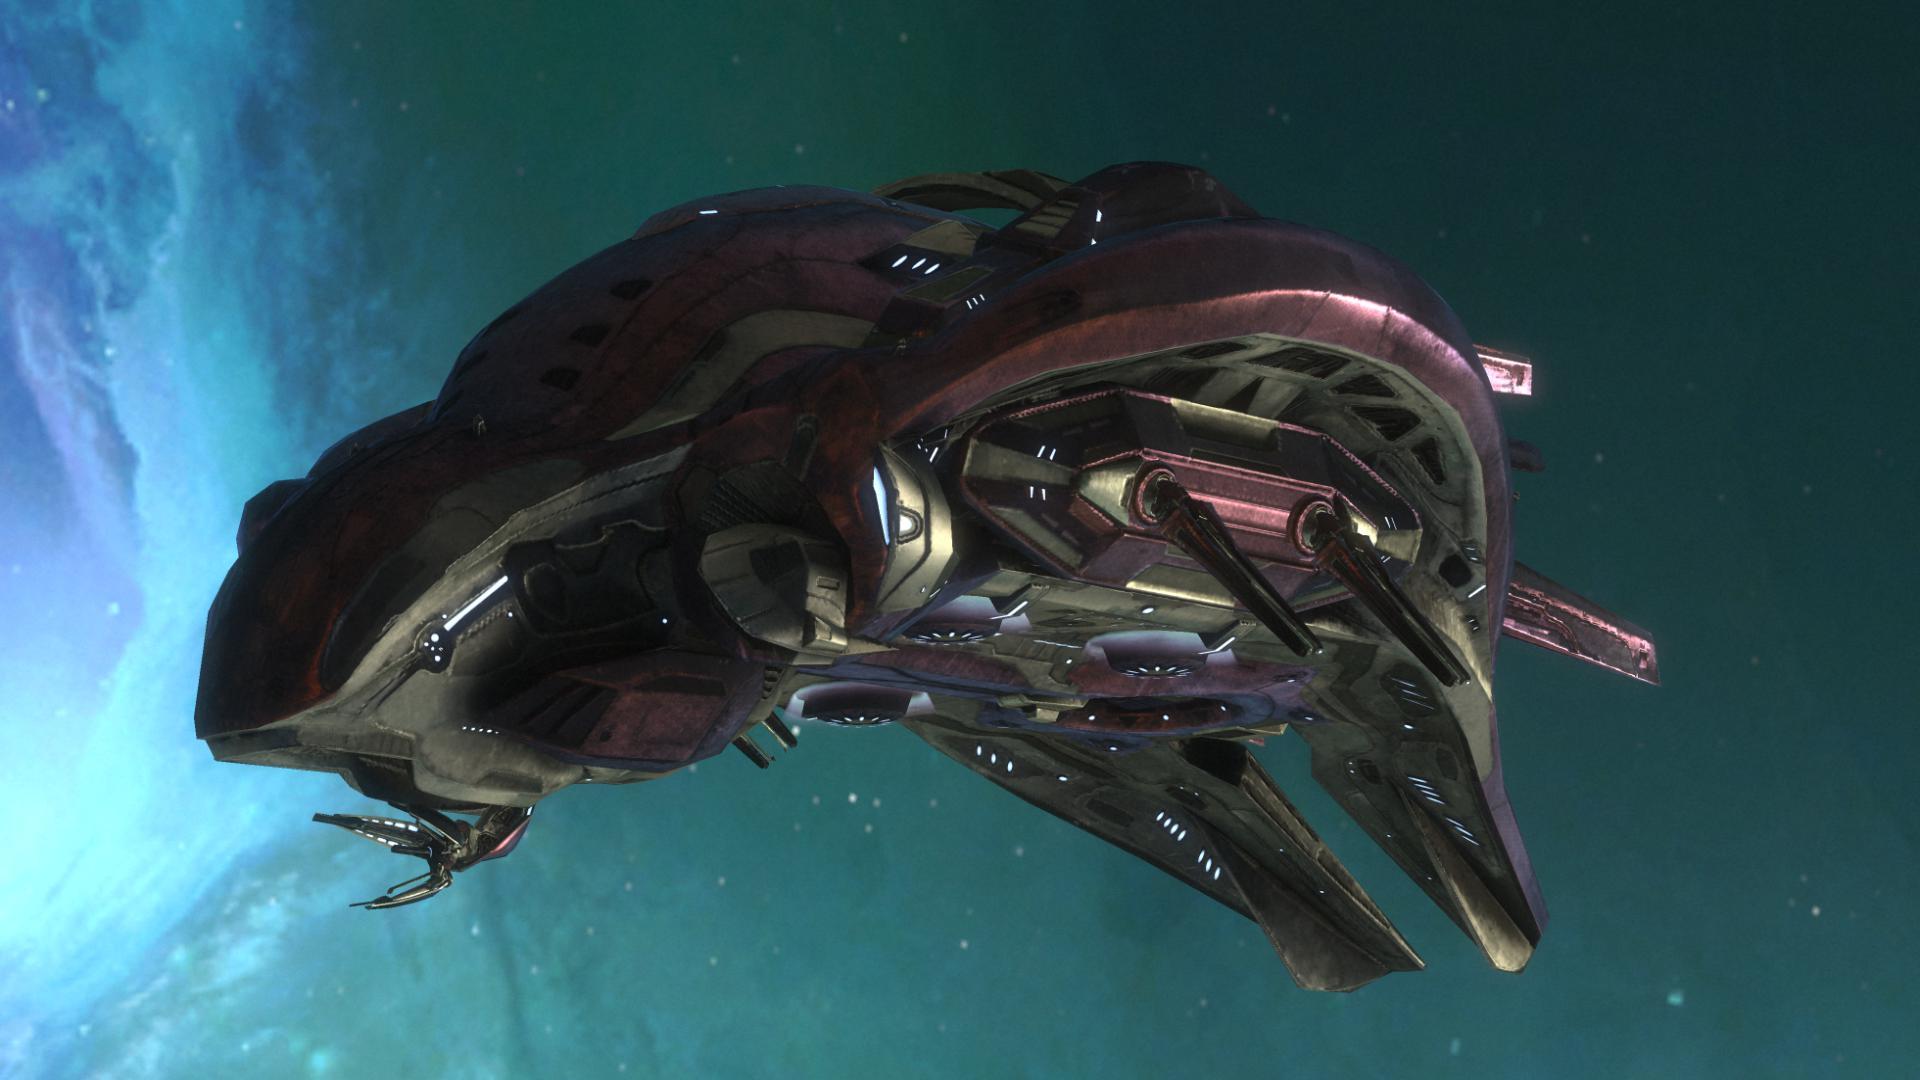 Image - Halo3 PhantomDropship LeftSide.png - Halo Nation ...  |Halo Reach Phantom